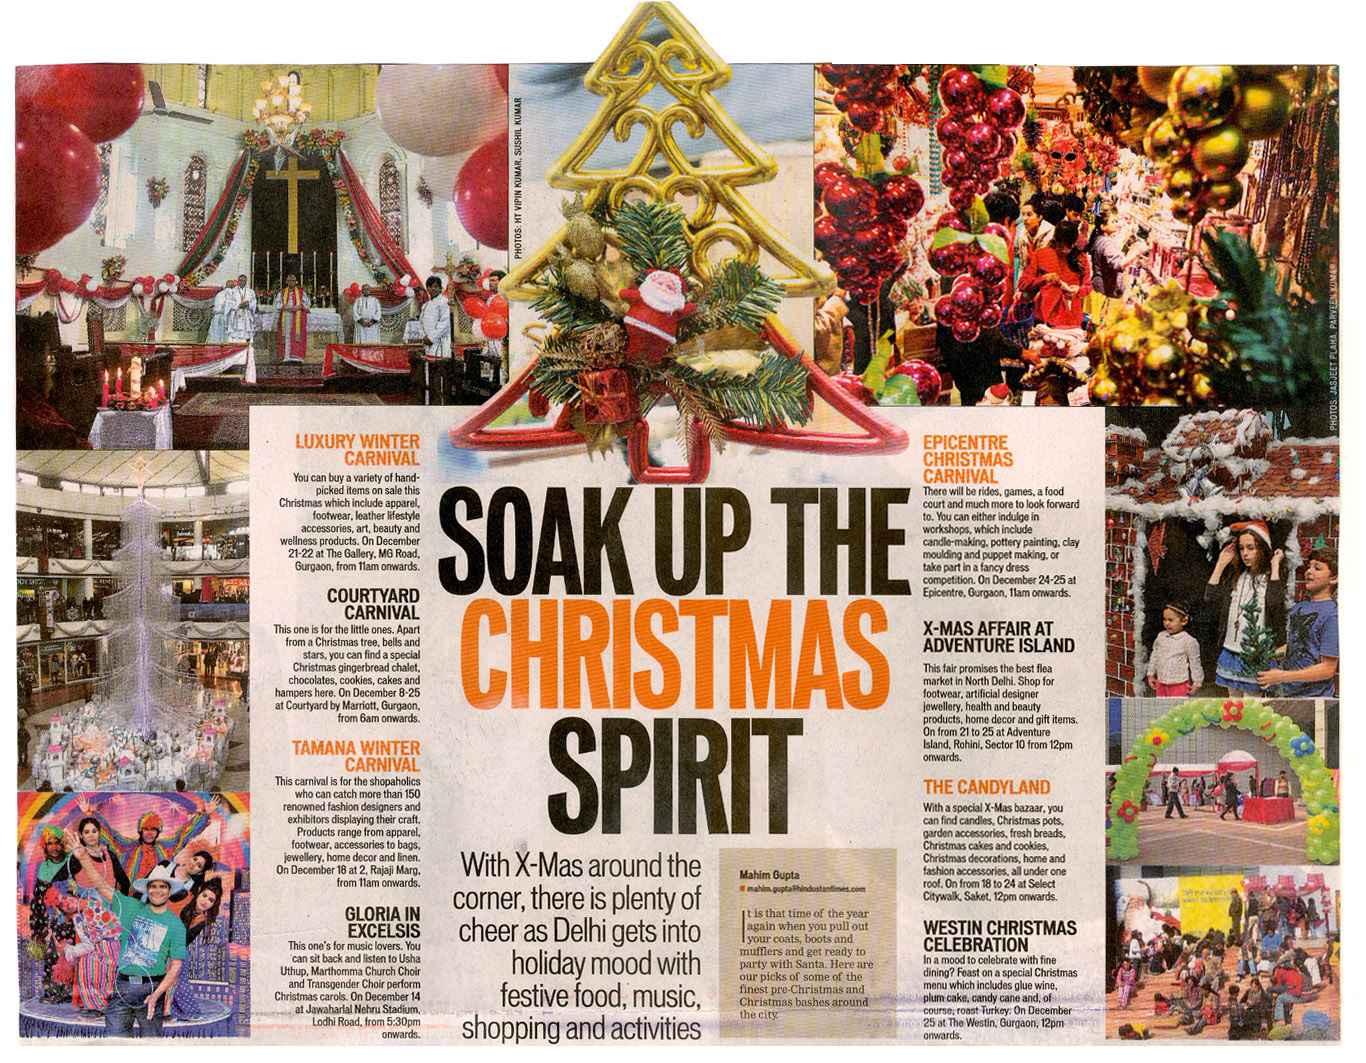 Soak up the Christmas spirit